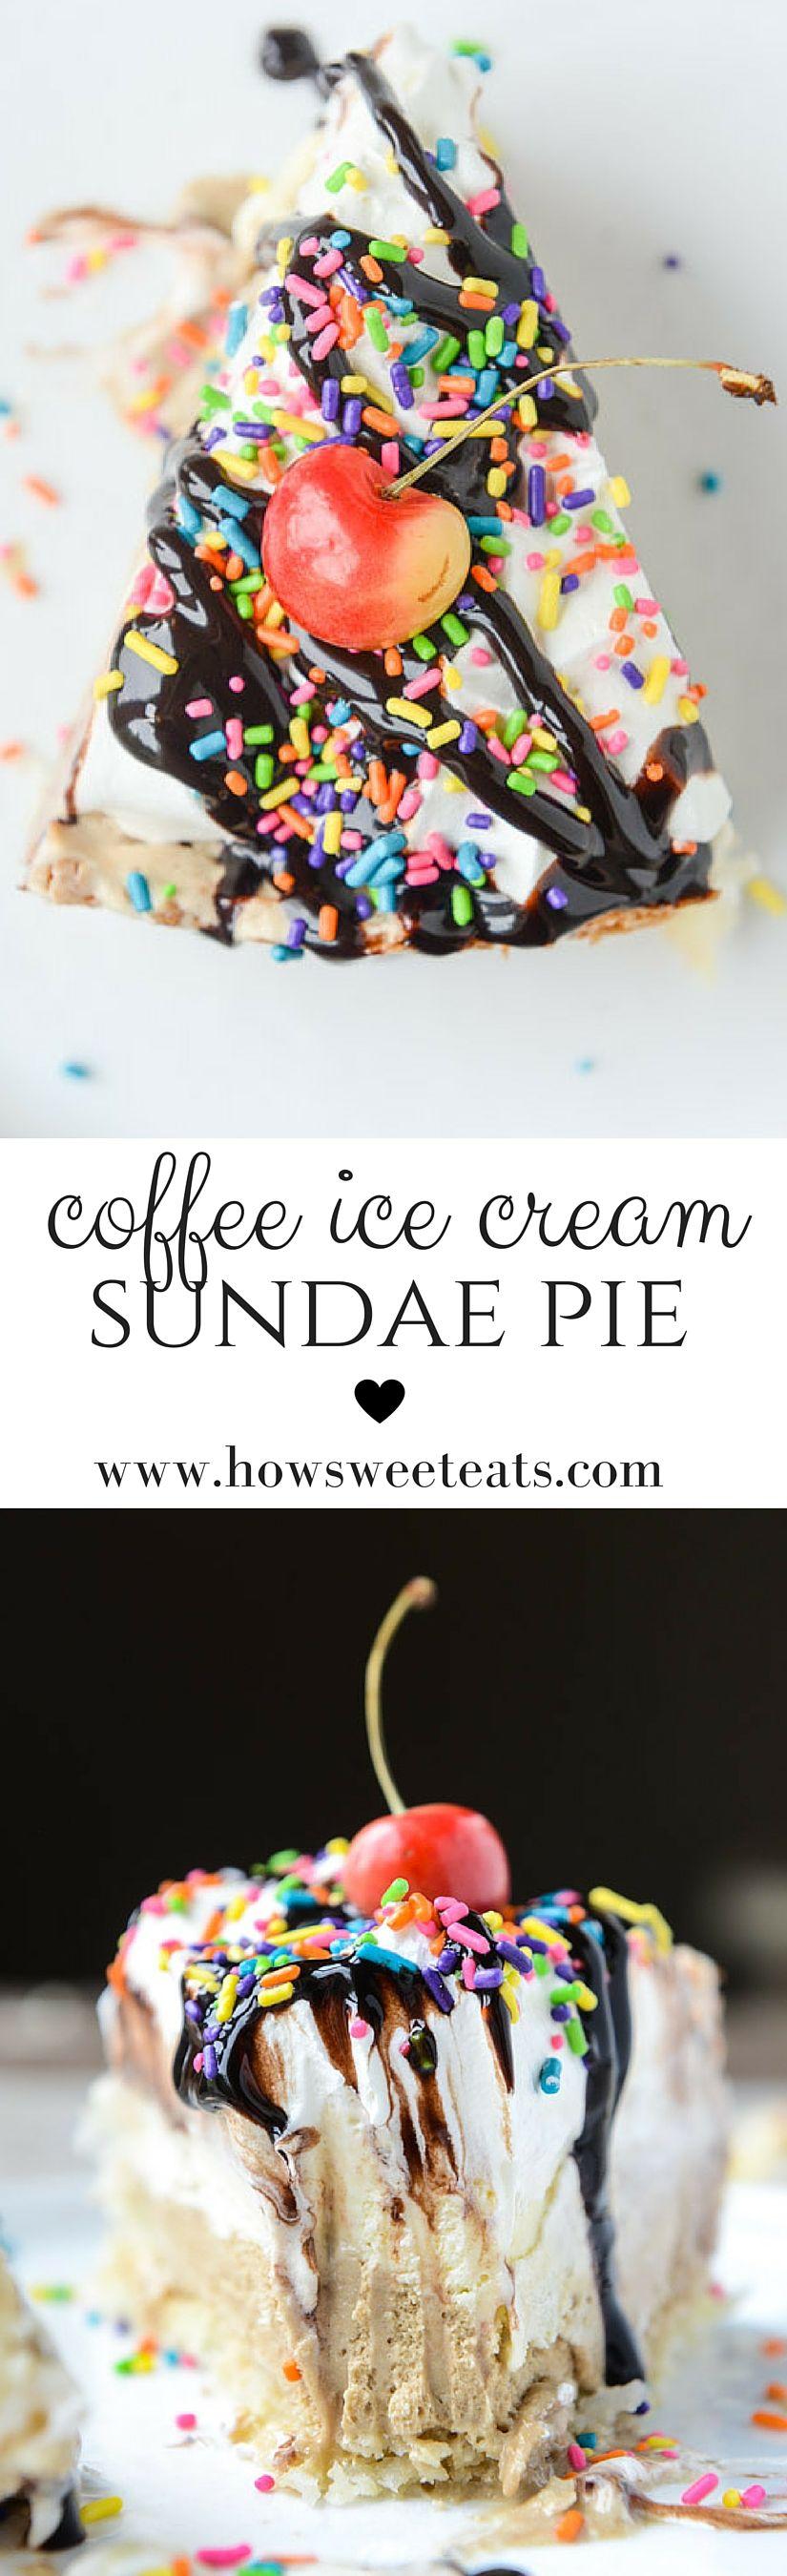 coffee ice cream hot fudge sundae pie with macaroon crust by @howsweeteats I howsweeteats.com